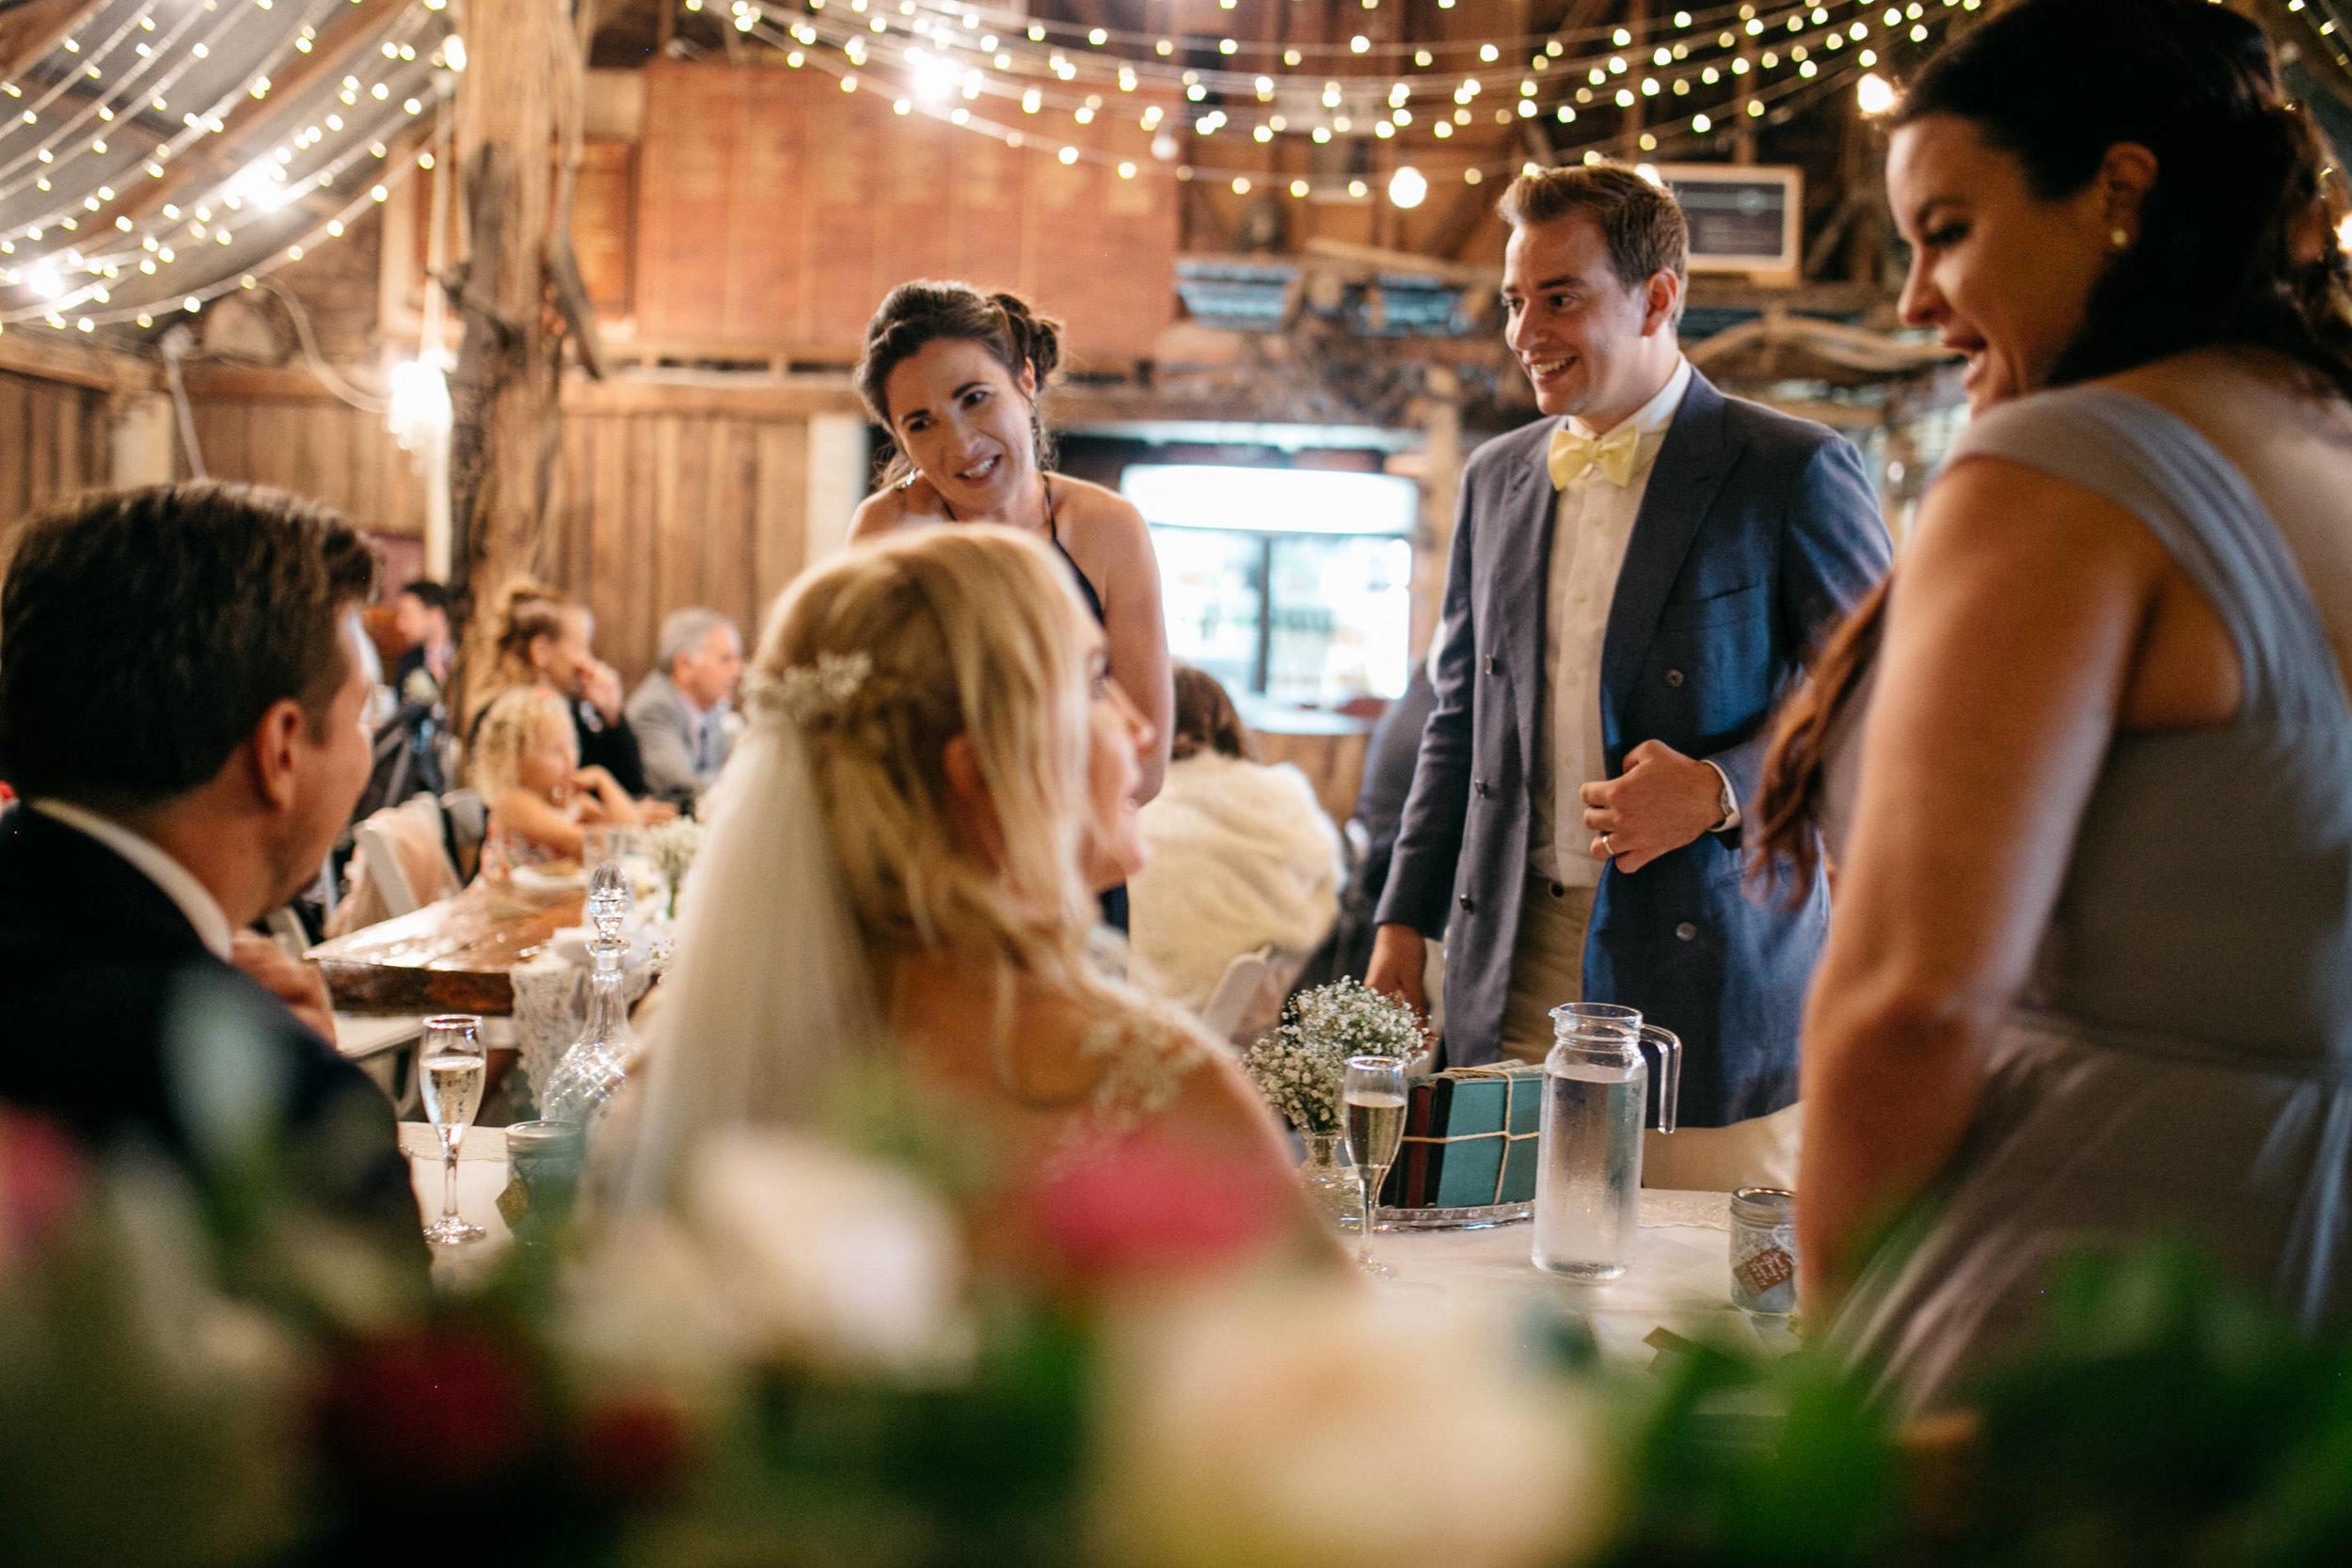 True North Photography_Boomerang Farm_Stacey and Isaac_Gold Coast Wedding_Barm Wedding_Hinterland Wedding-196.jpg